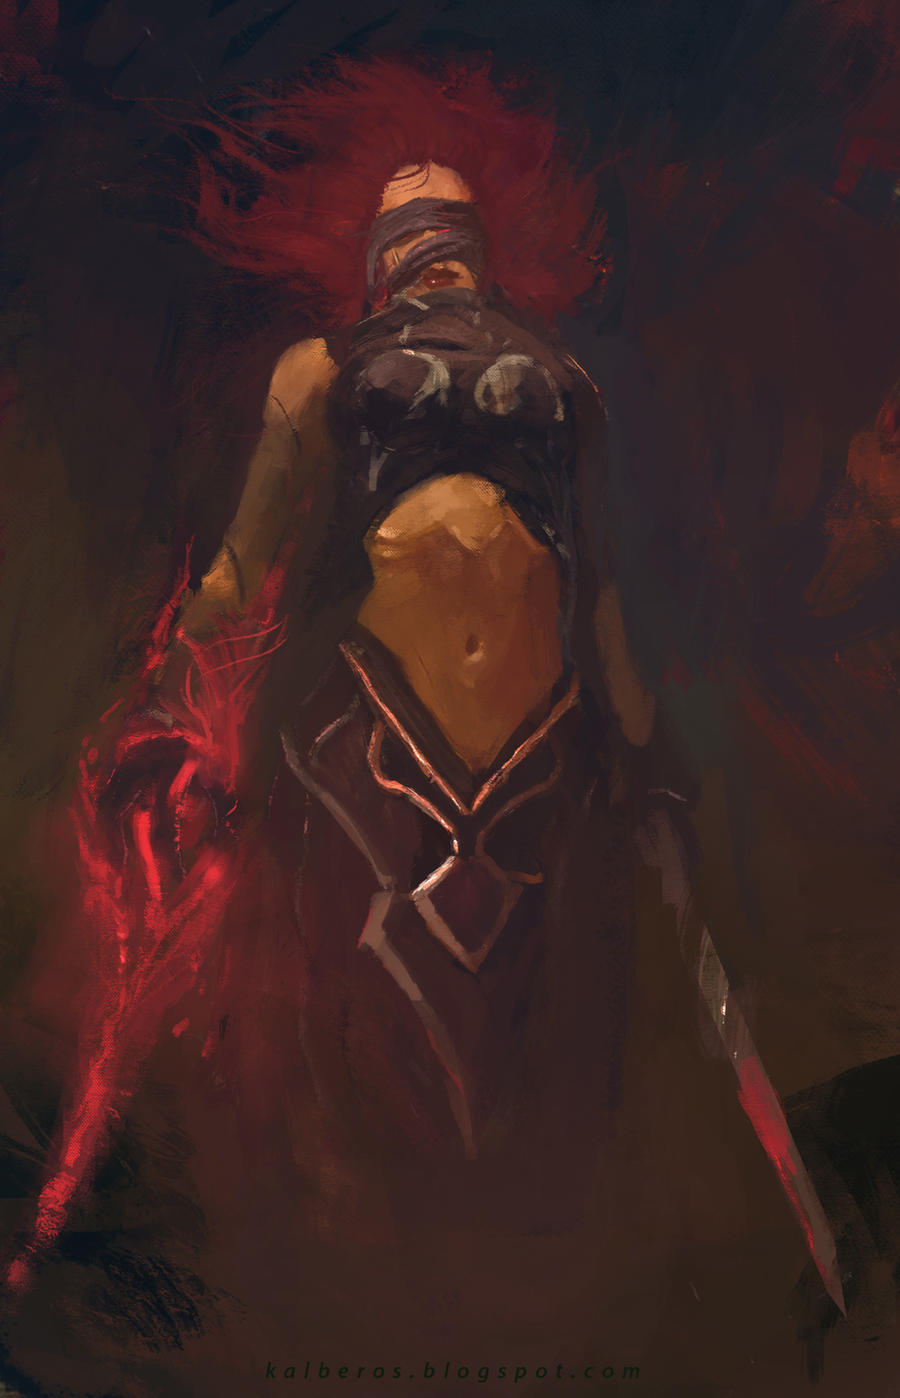 Vampire-warrior-girl sex image